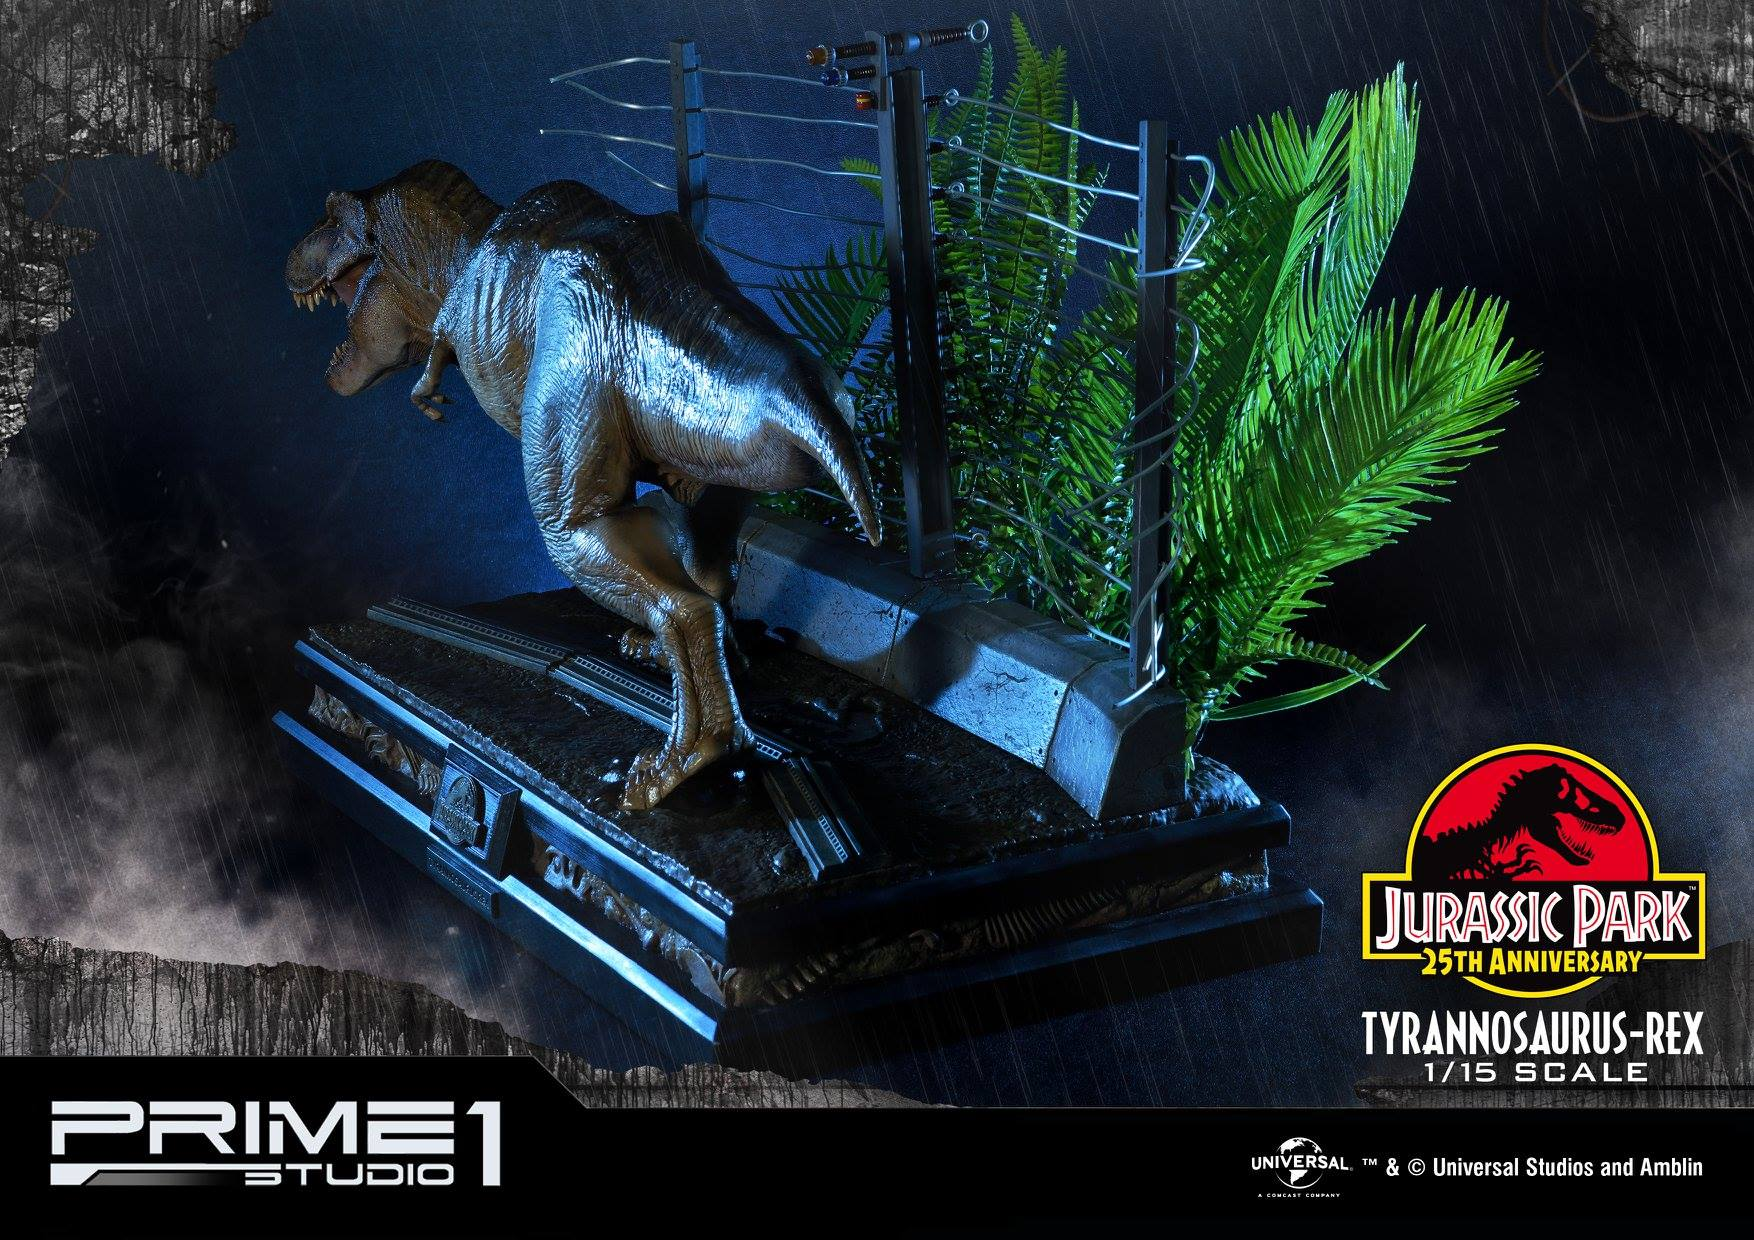 Prime 1 Studio Jurassic Park Tyrannosaurus Rex 115 Statue Toyslife 1993 15 Lightbox Prev Next Prime1 T